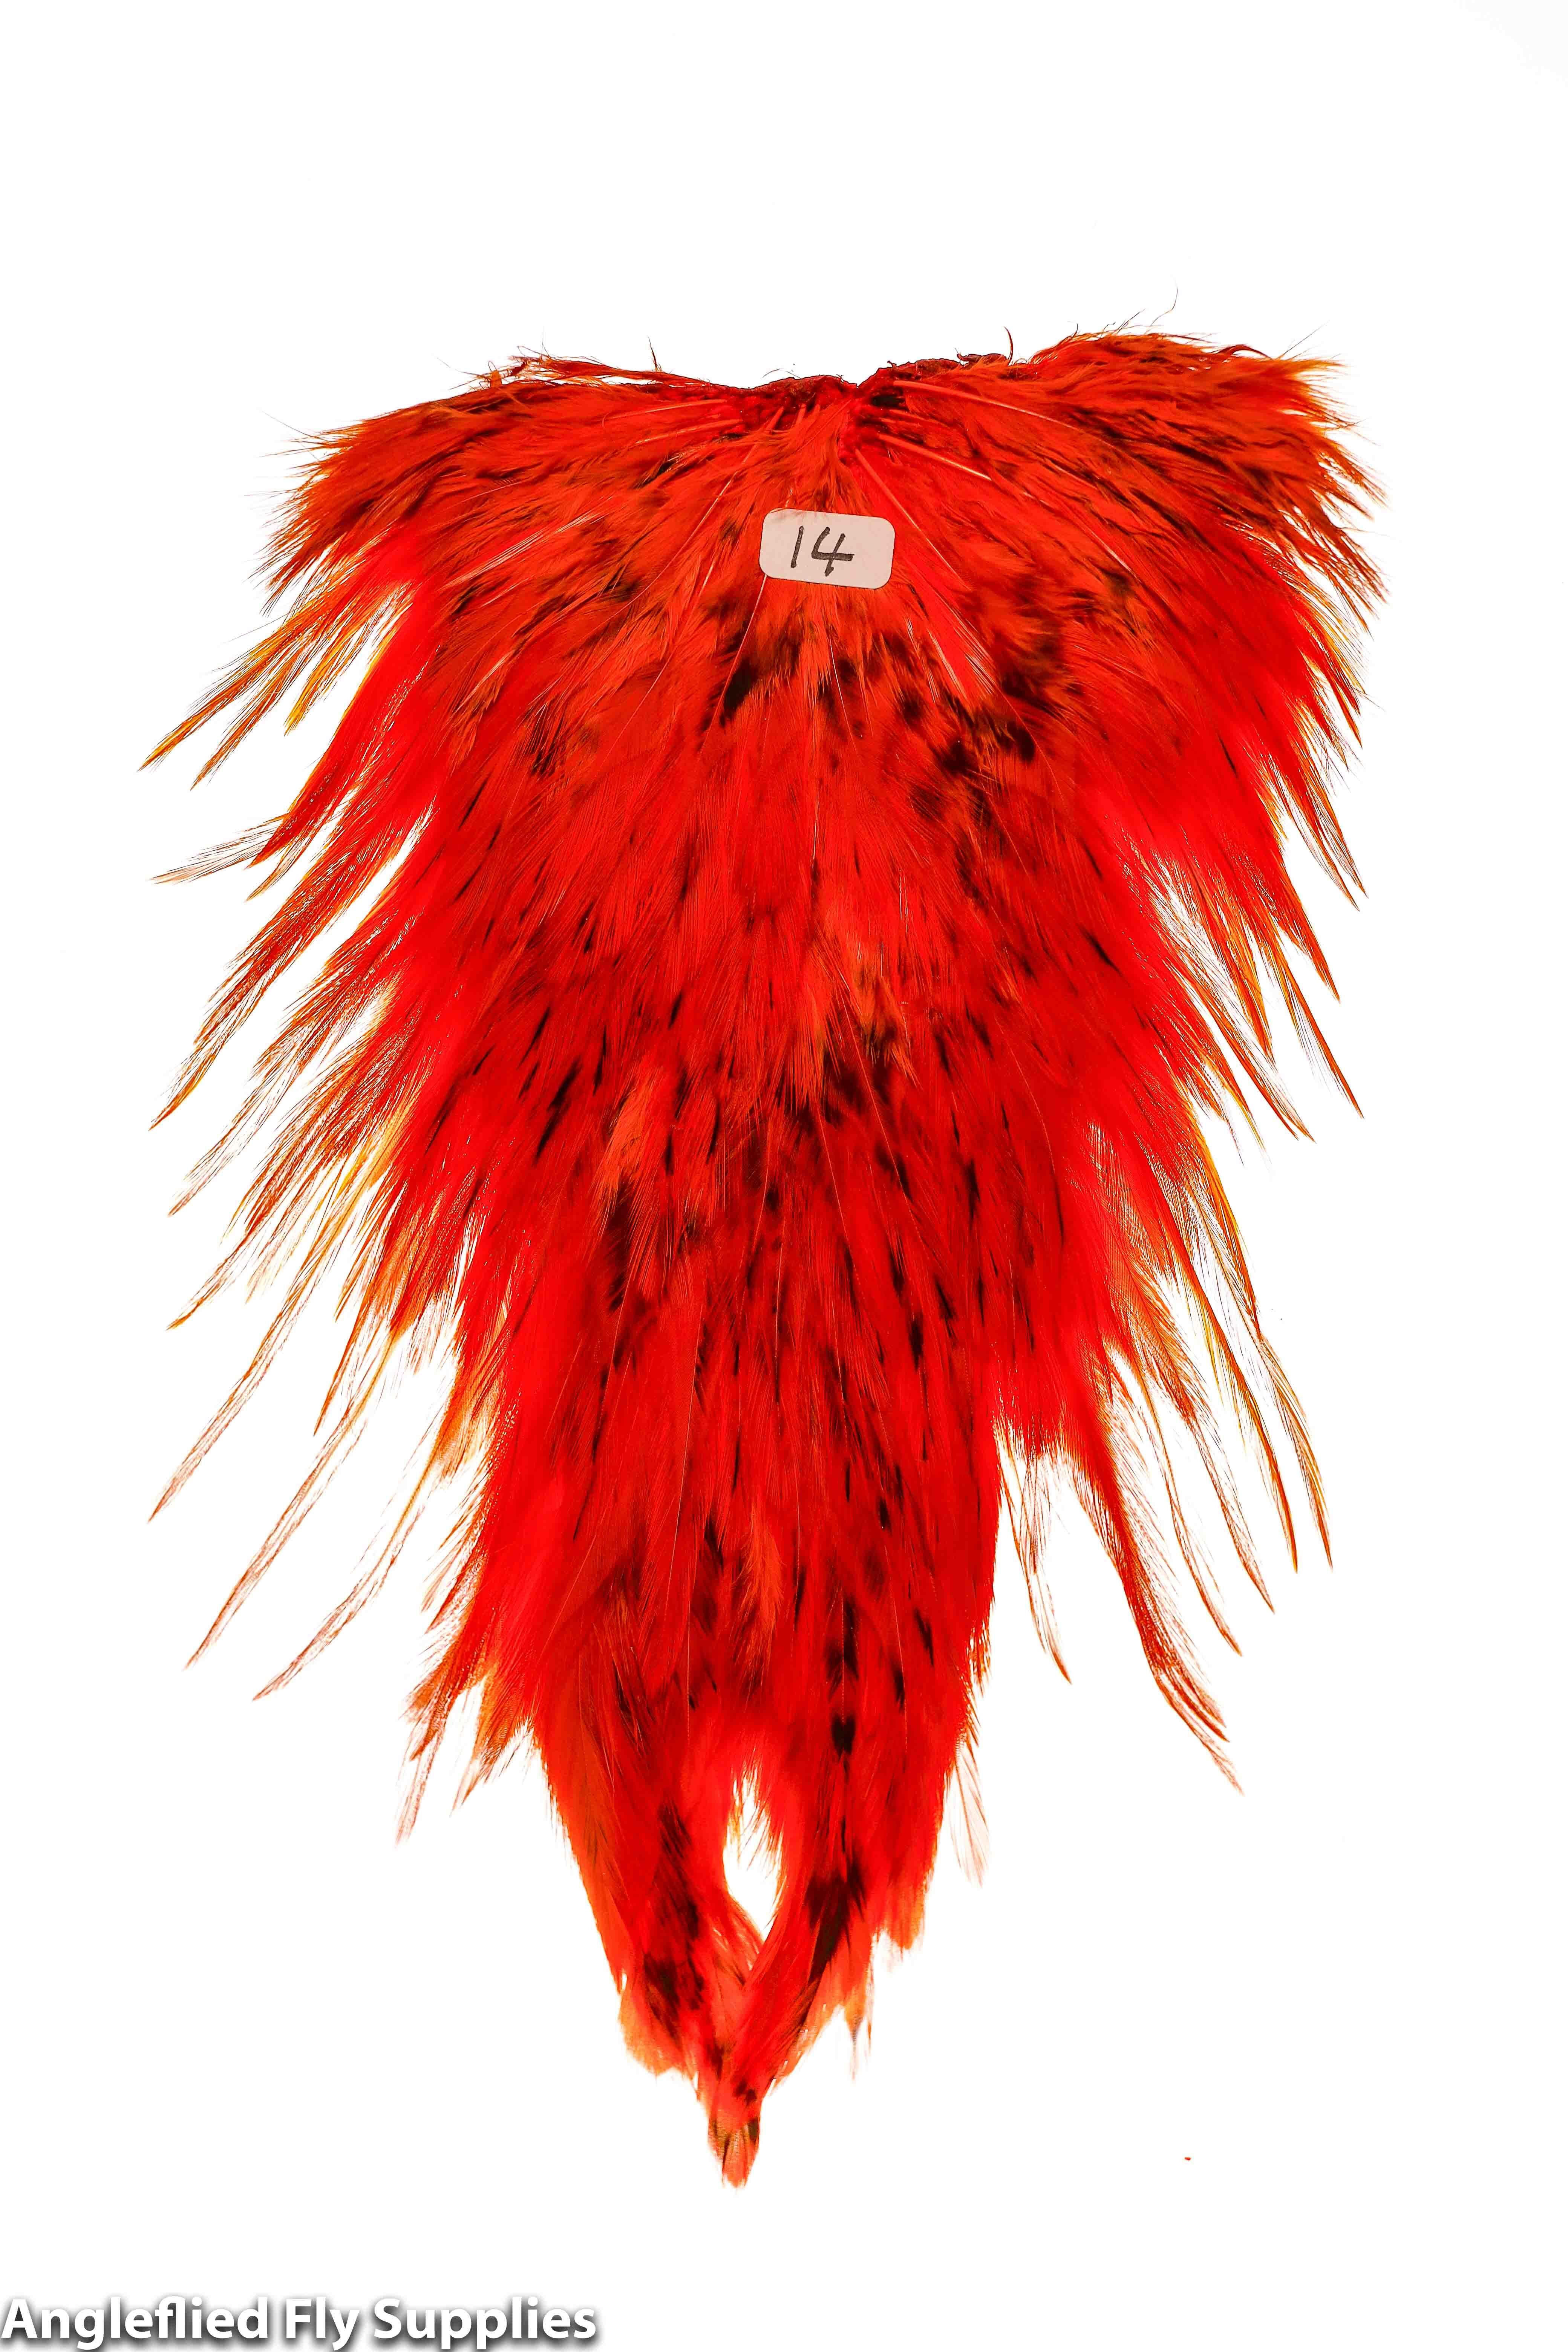 【 AFS 】Indian Cock Saddle dyd ORANGE